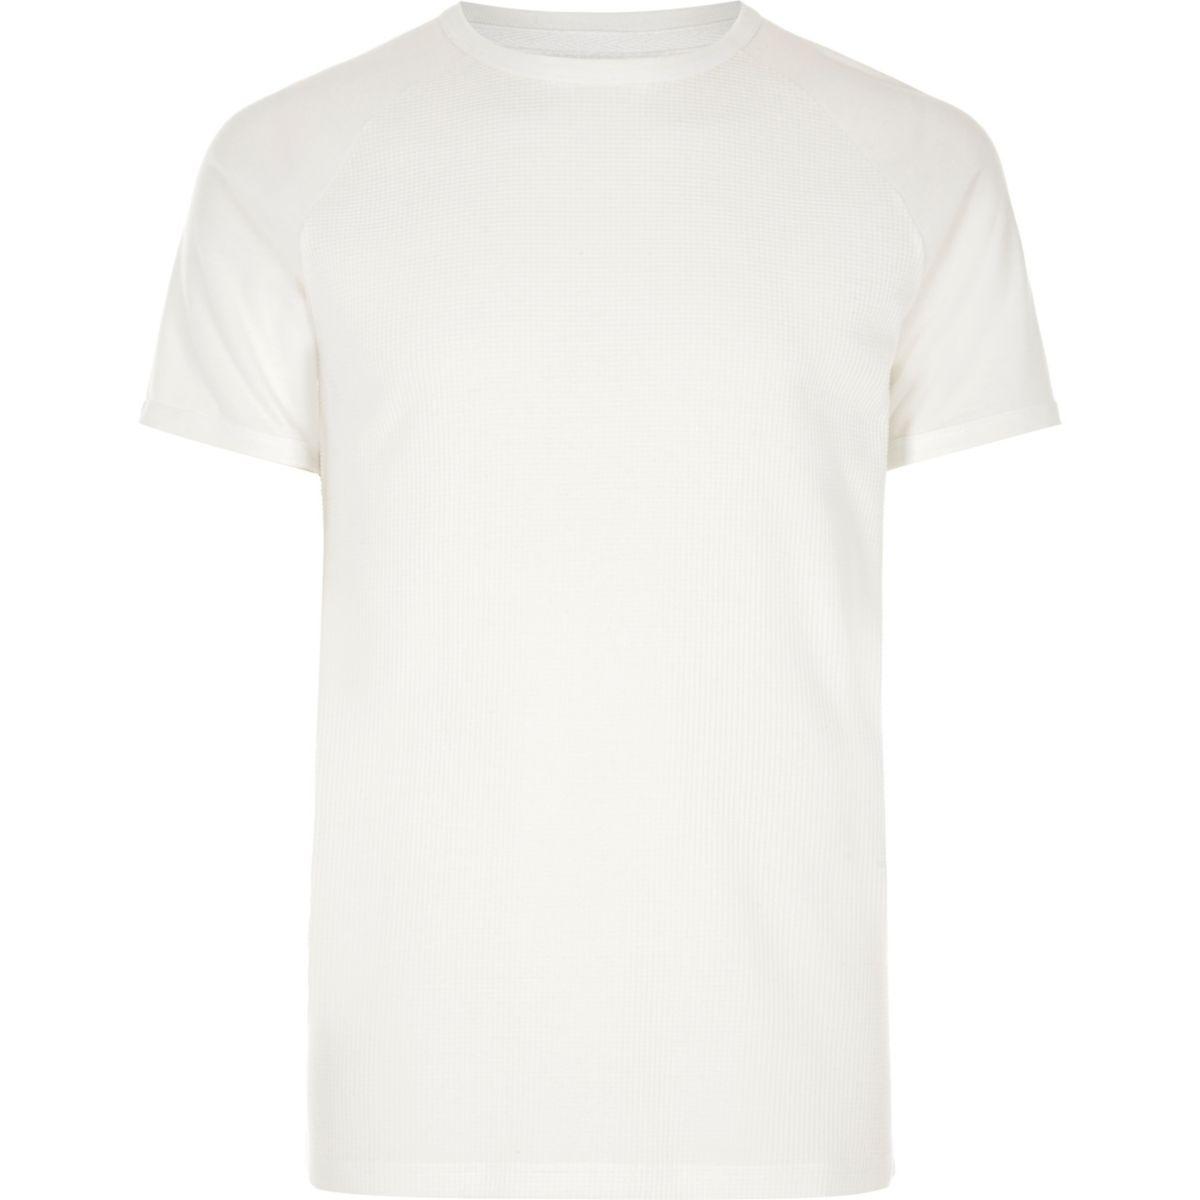 White waffle short sleeve raglan T-shirt